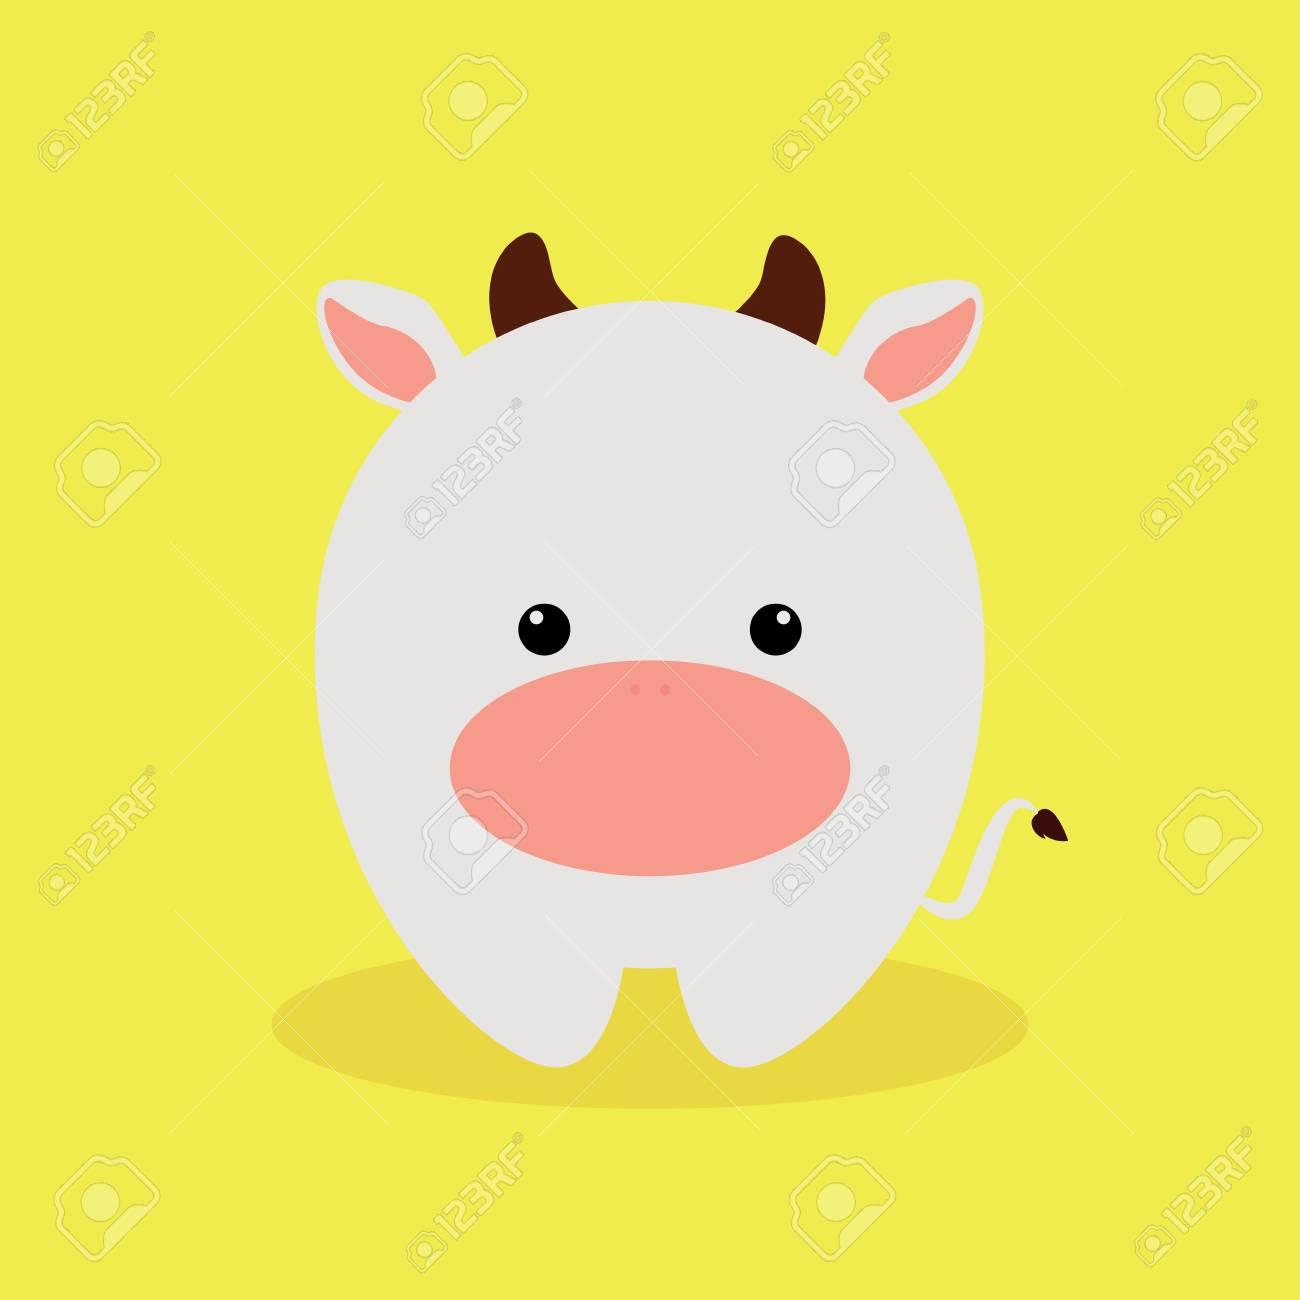 Cute Cartoon Animals On A Yellow Background